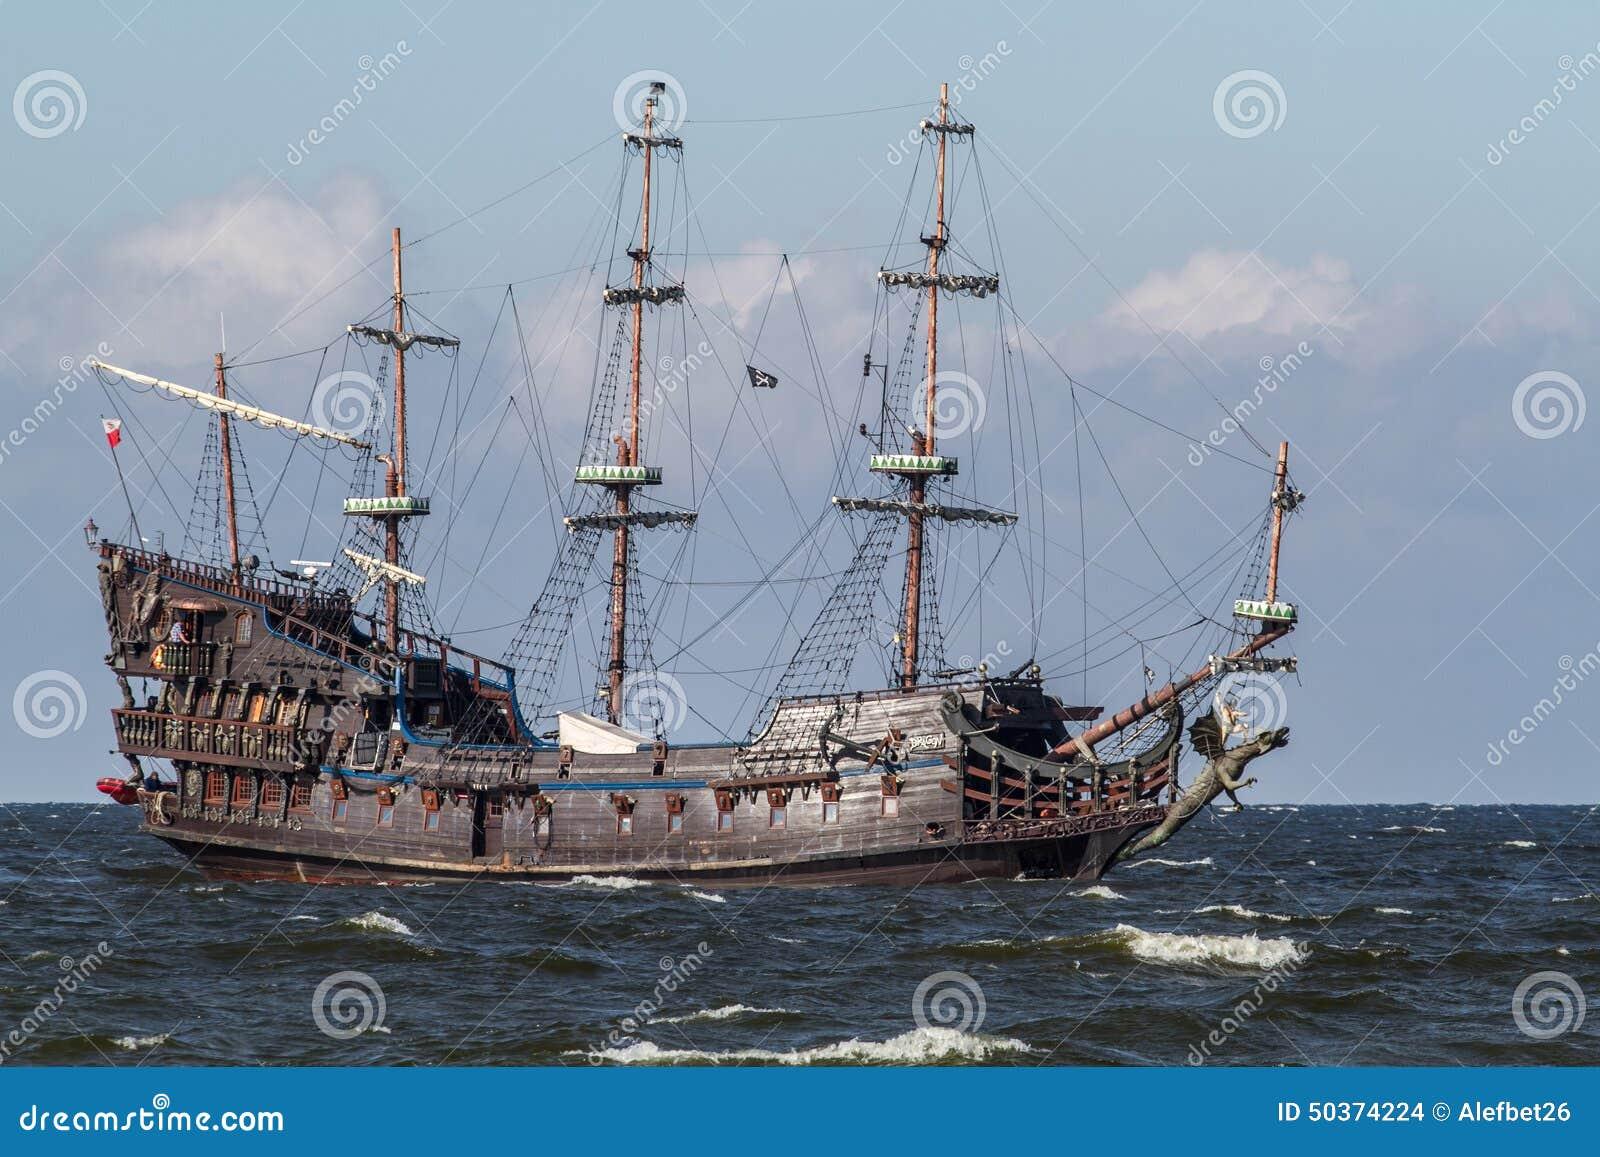 poland baltic sea old sailing ship stock photo image of sailing